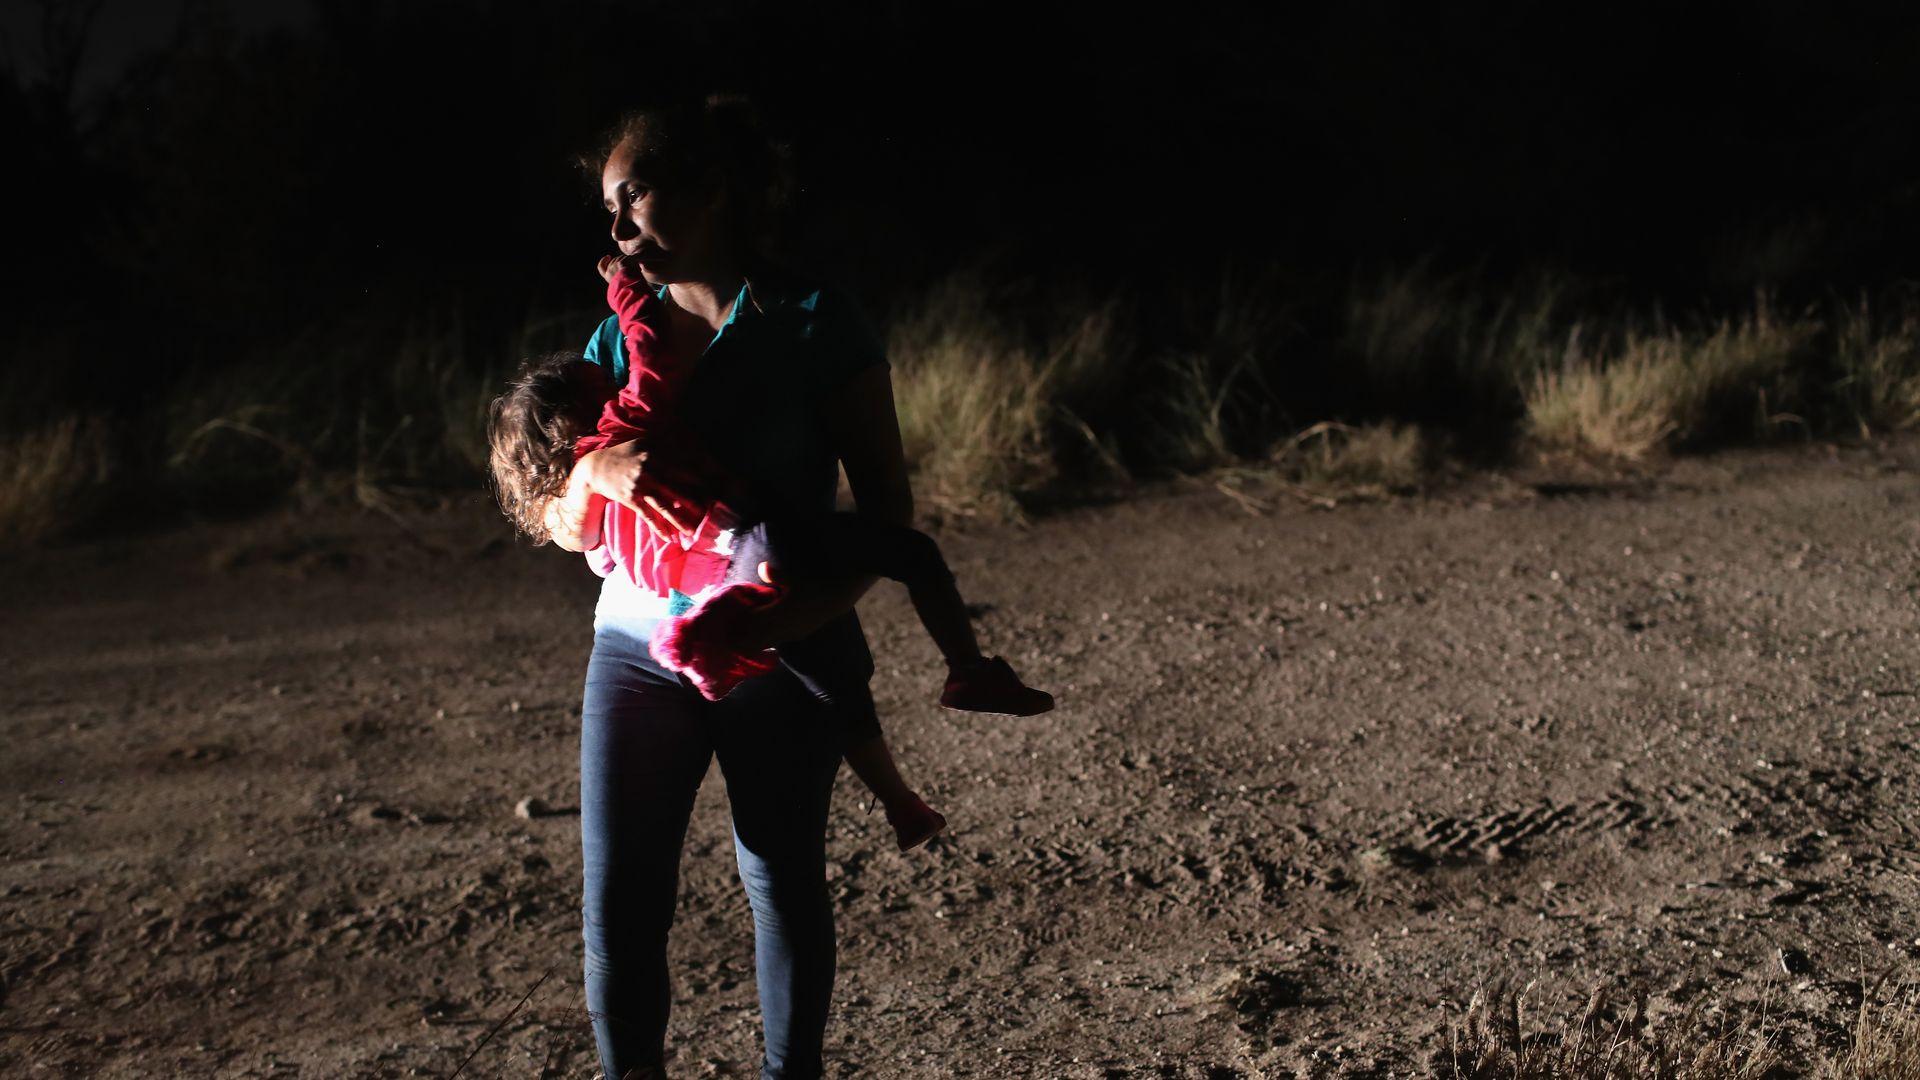 Border patrol agents detaining migrants